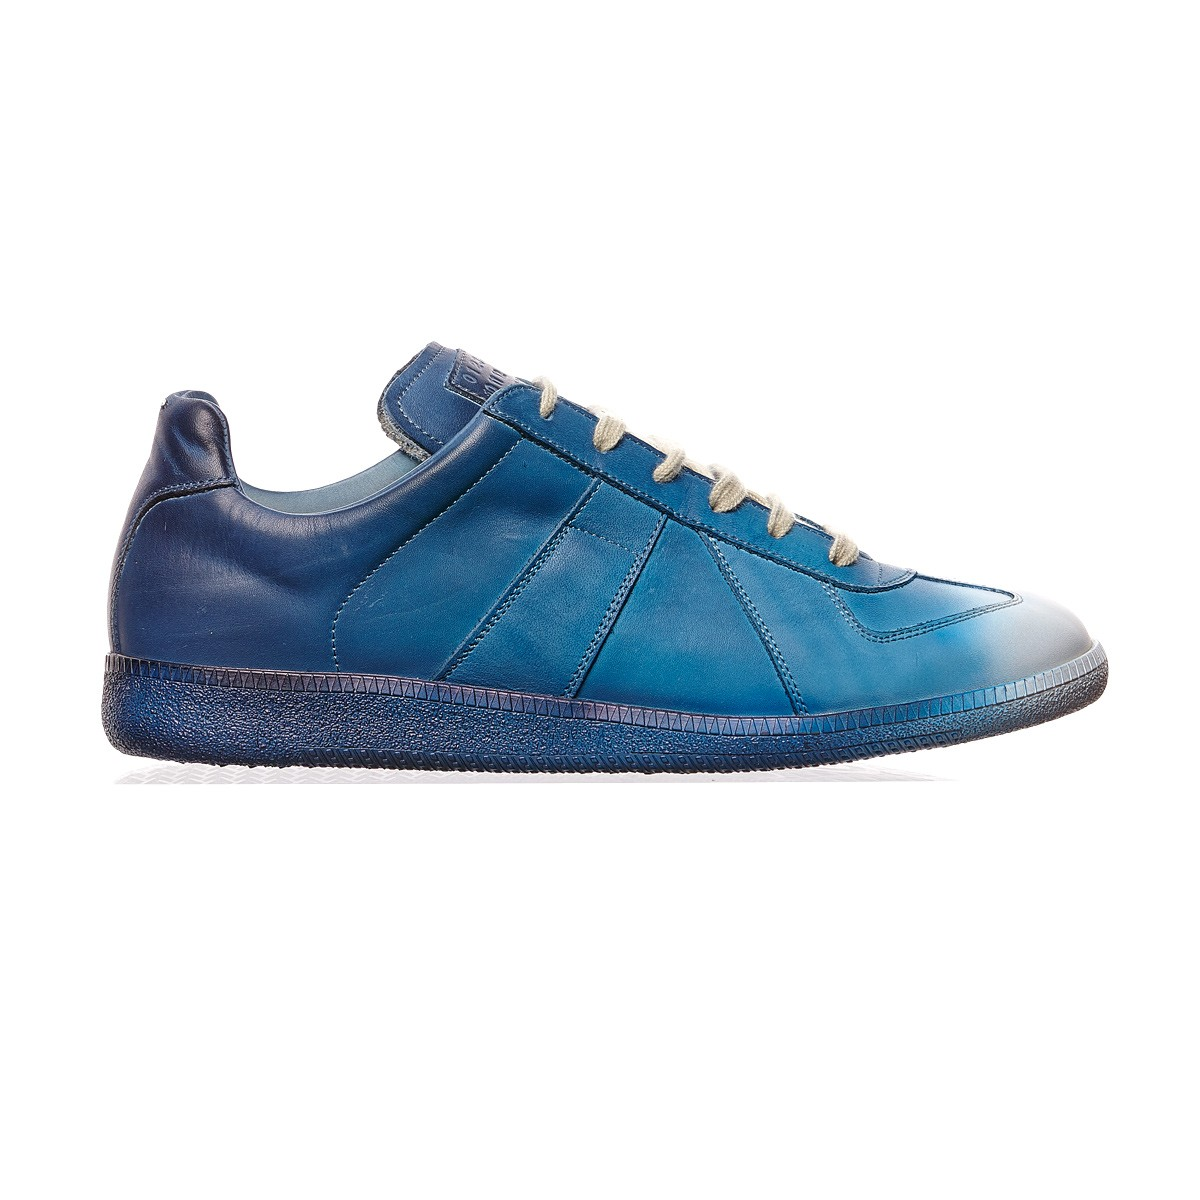 maison-martin-margiela-replica-airbrush-blue